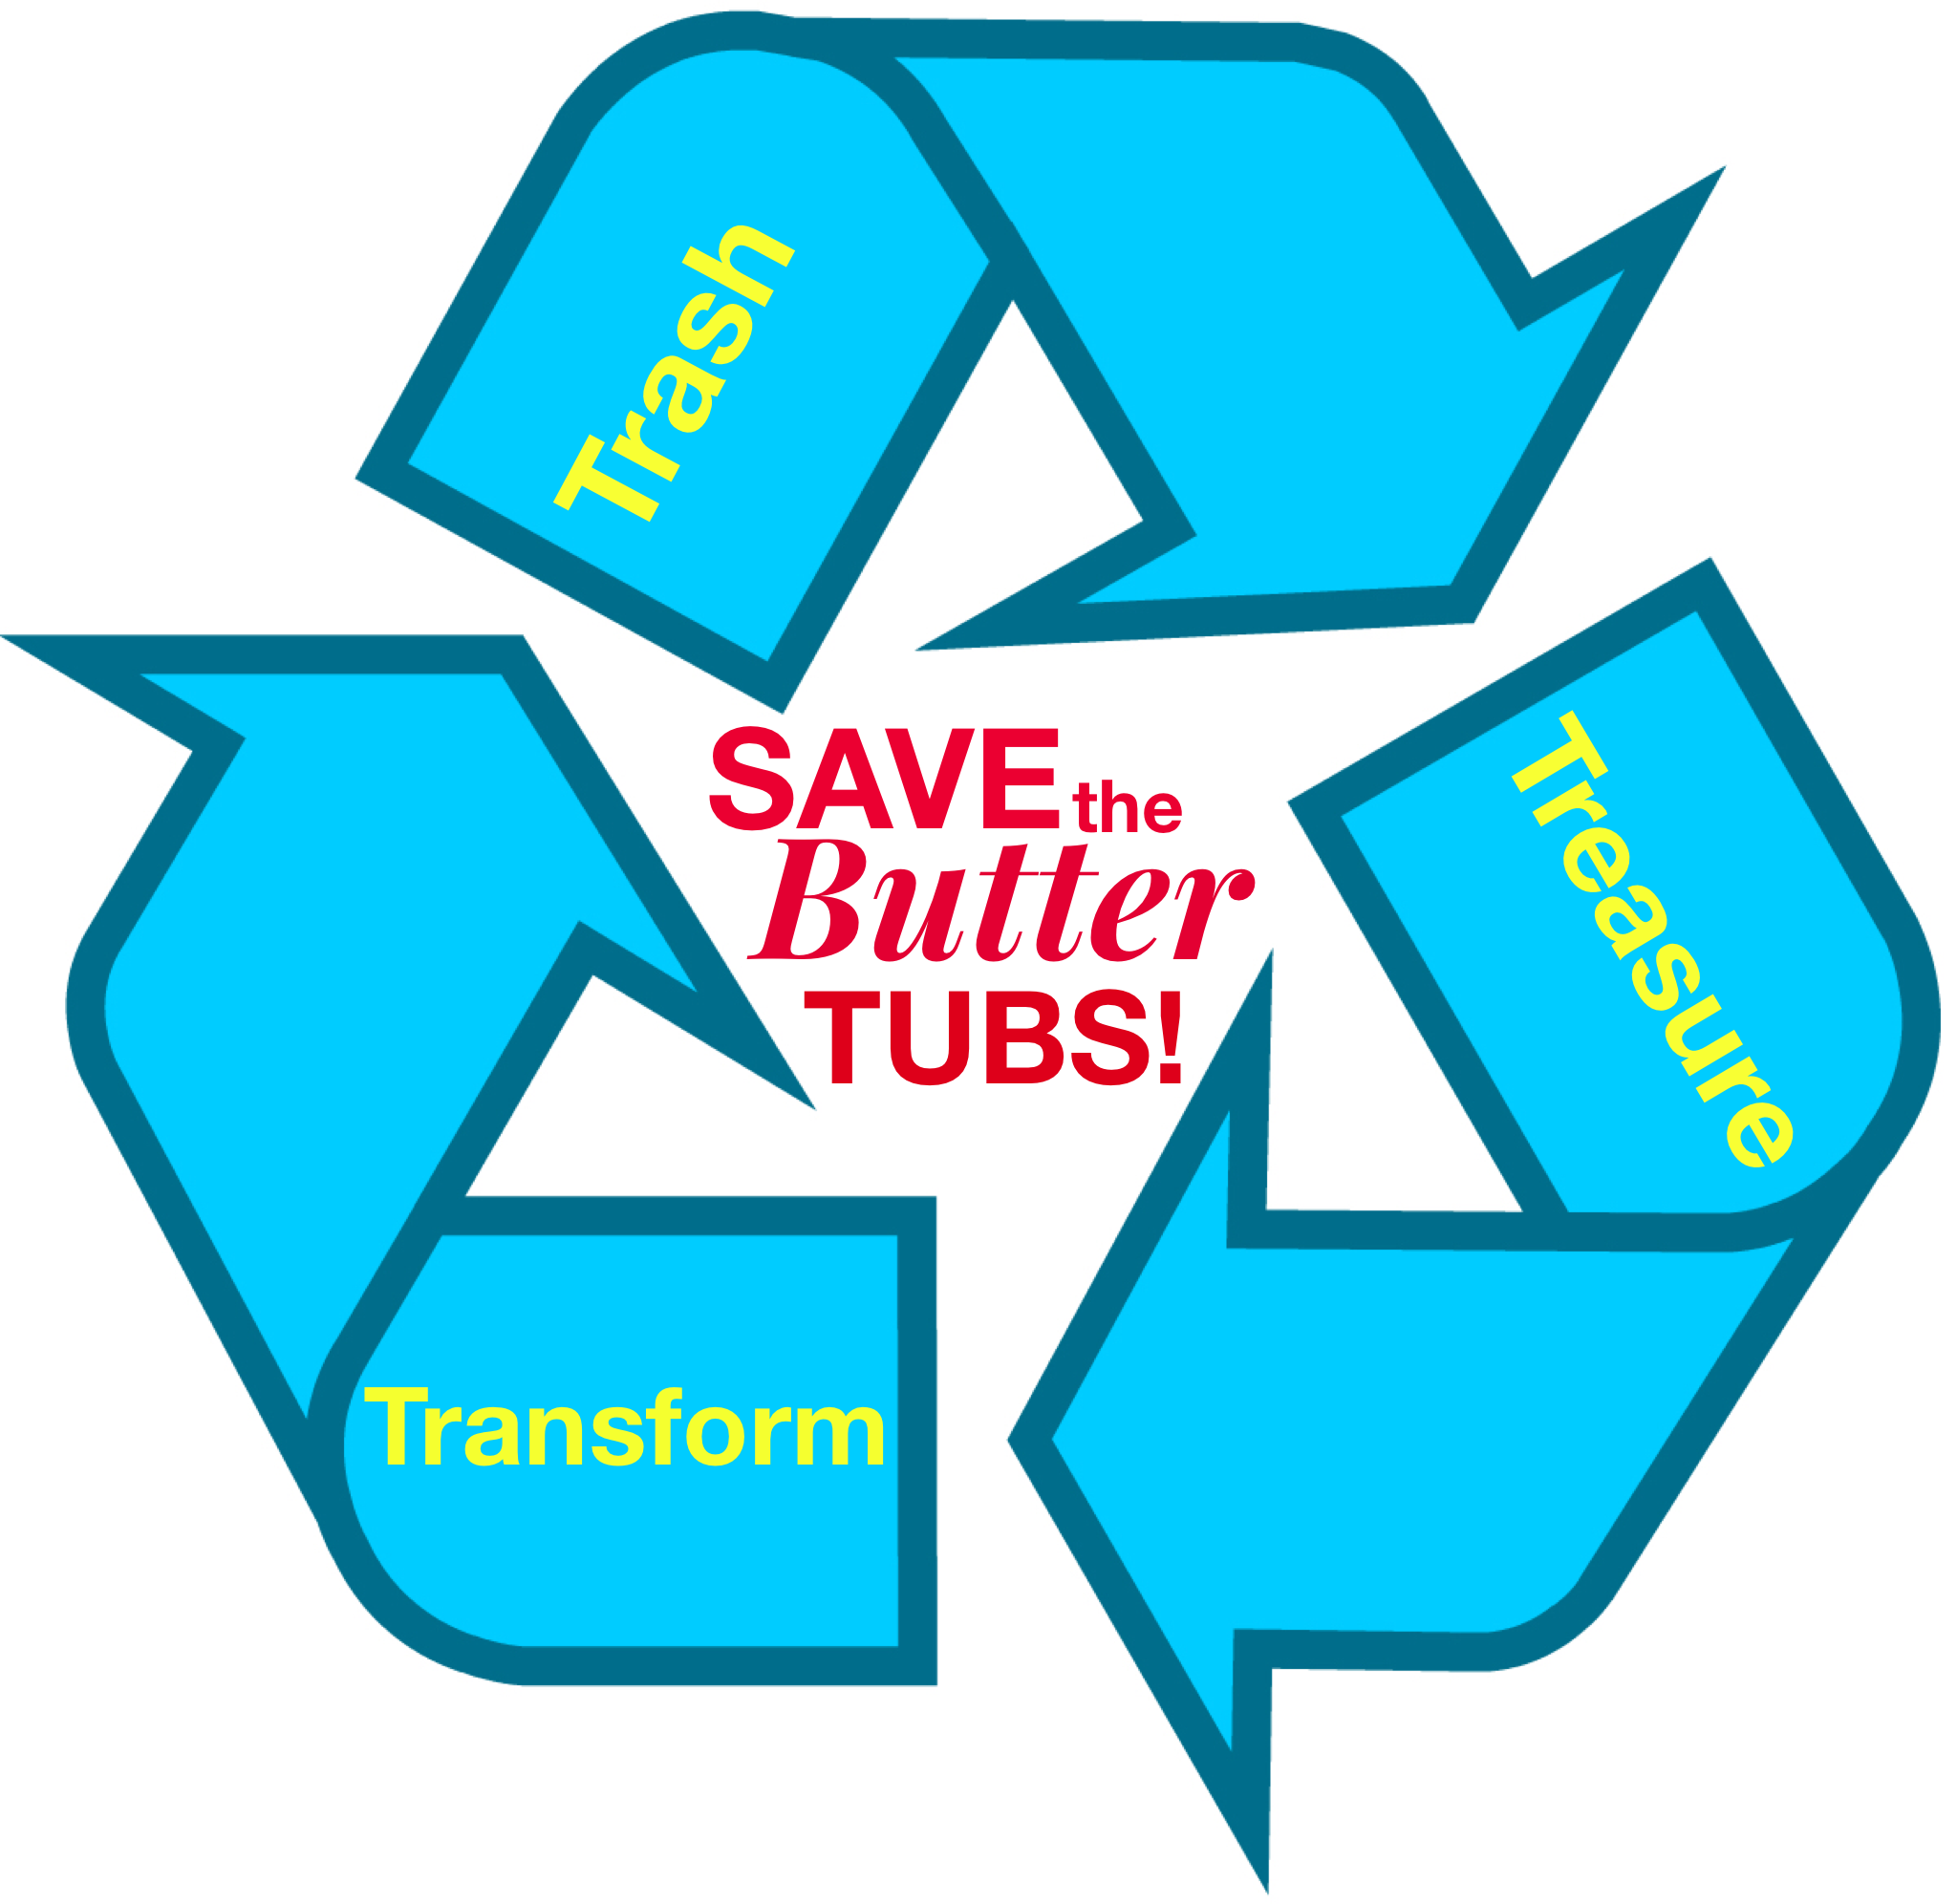 Save the Butter Tubs-trash-treasure-transform